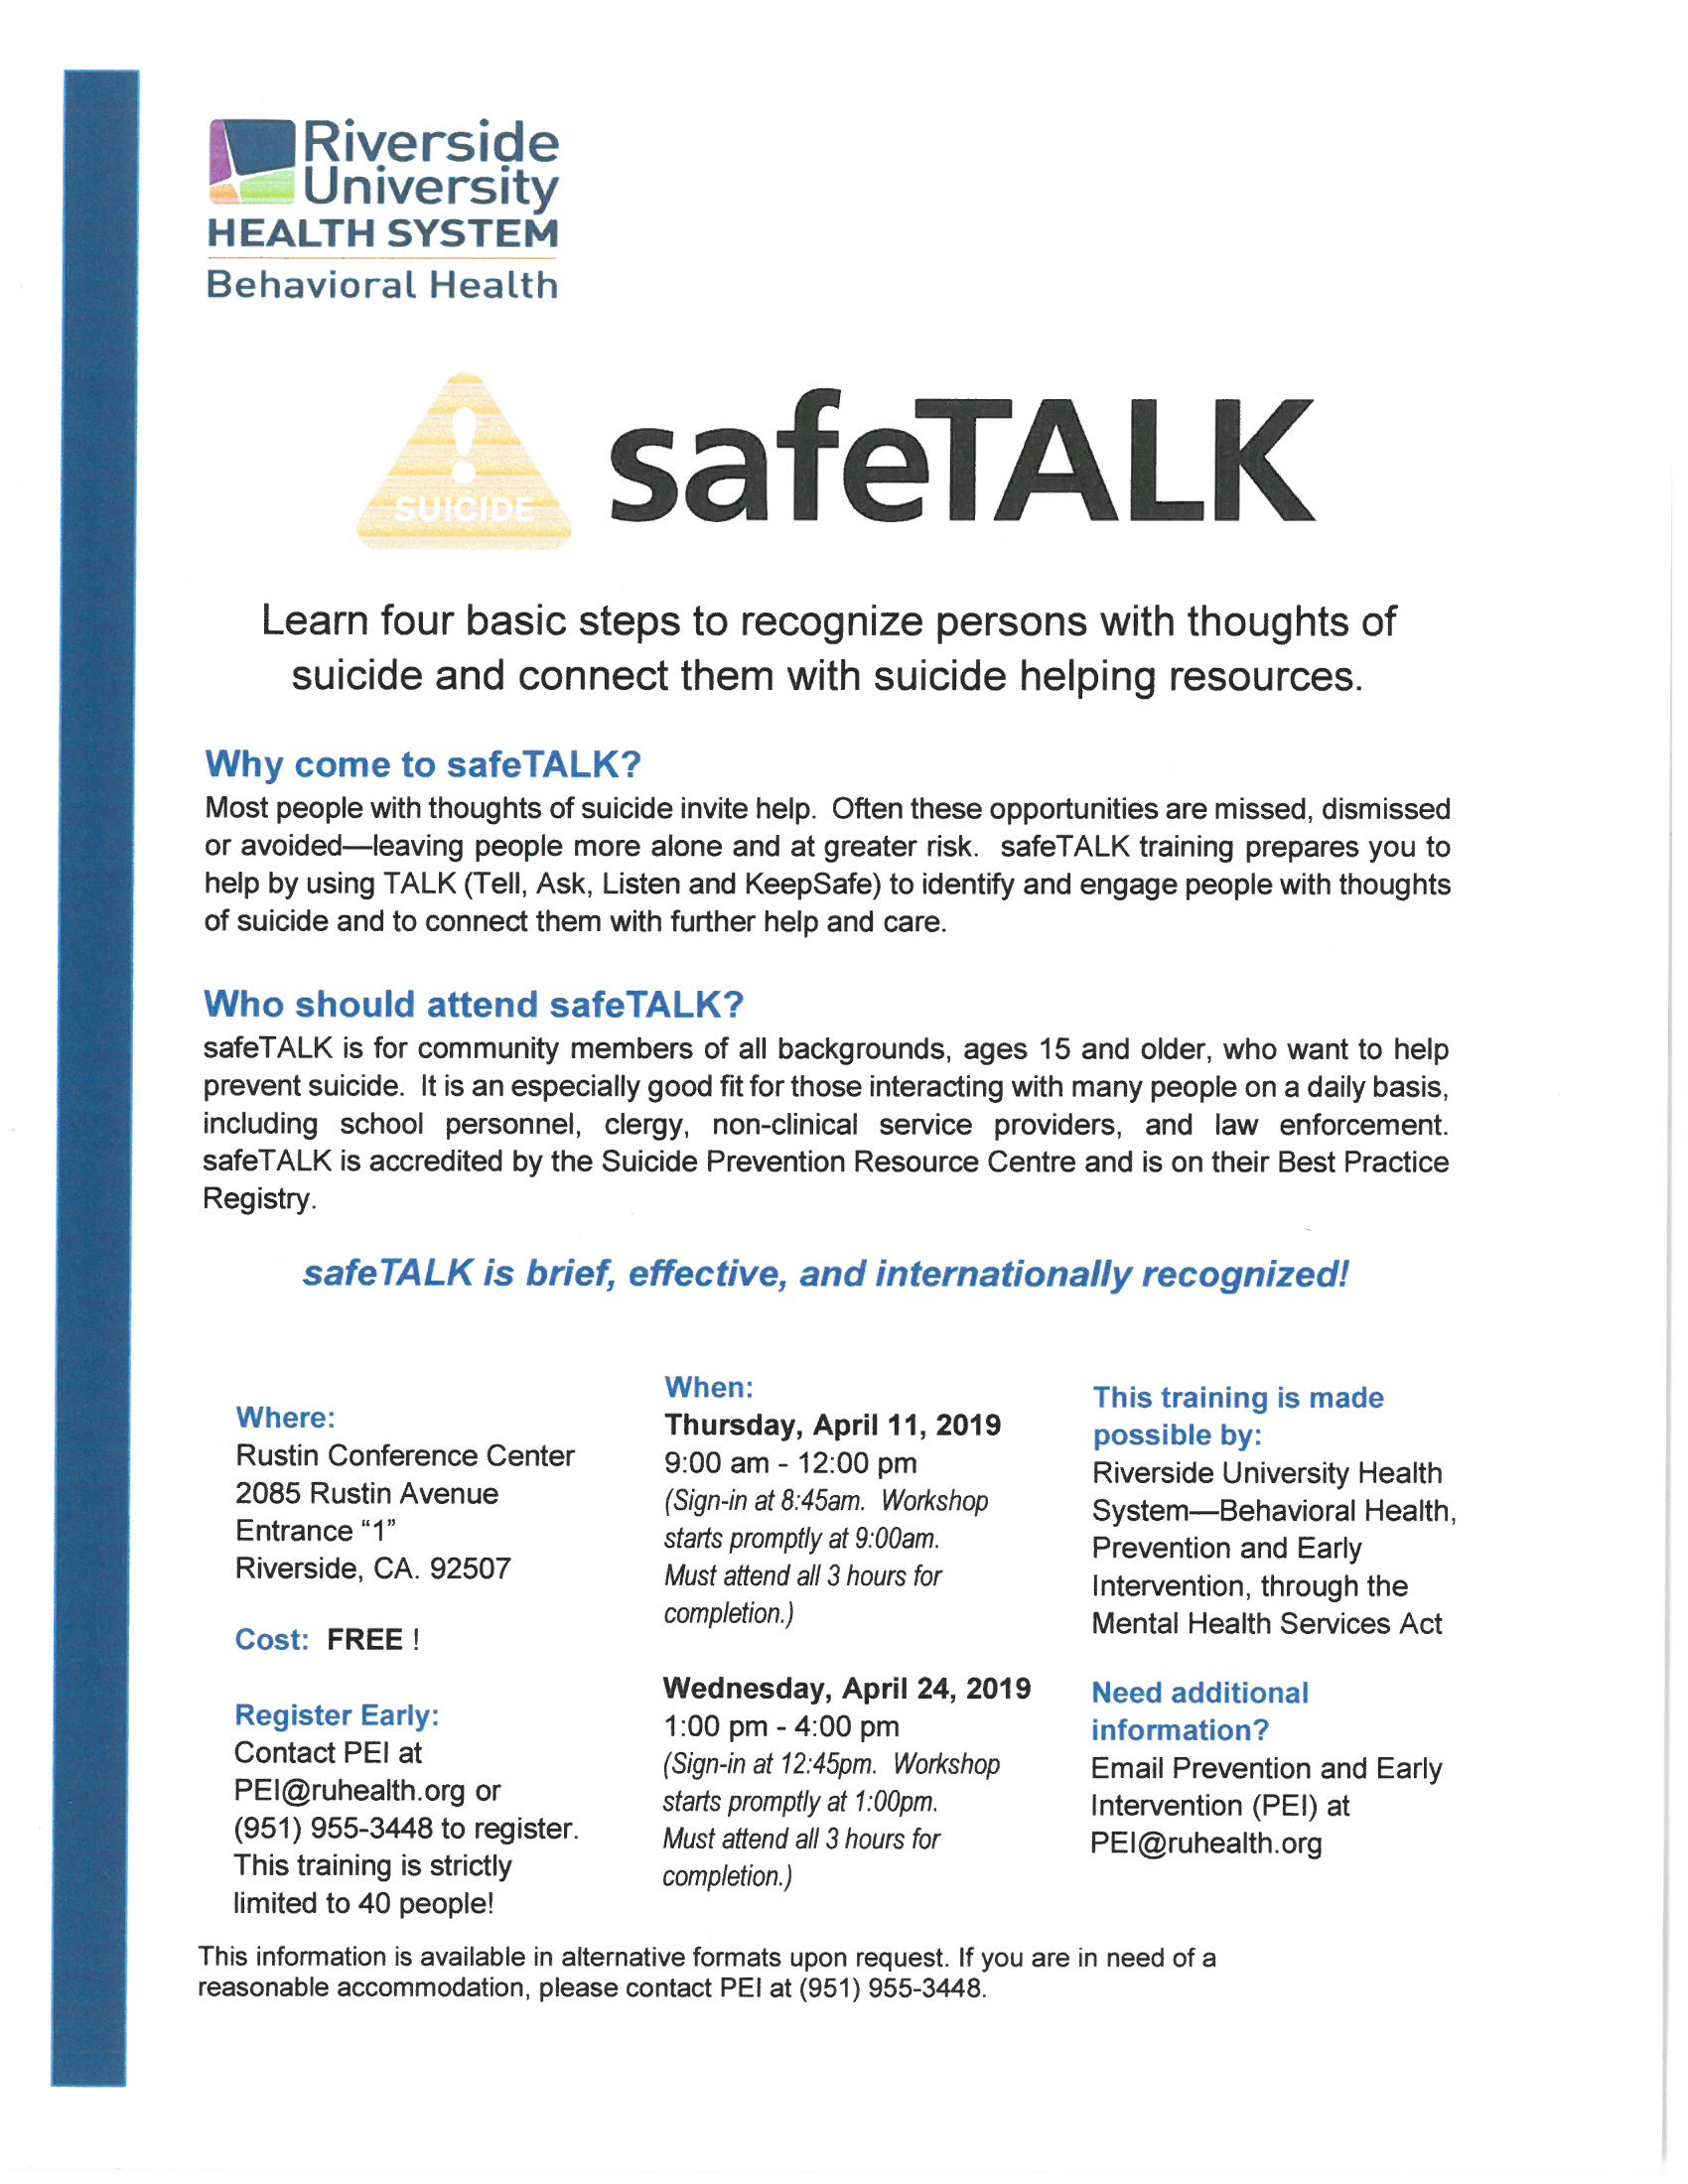 safeTalk – Community Health Association